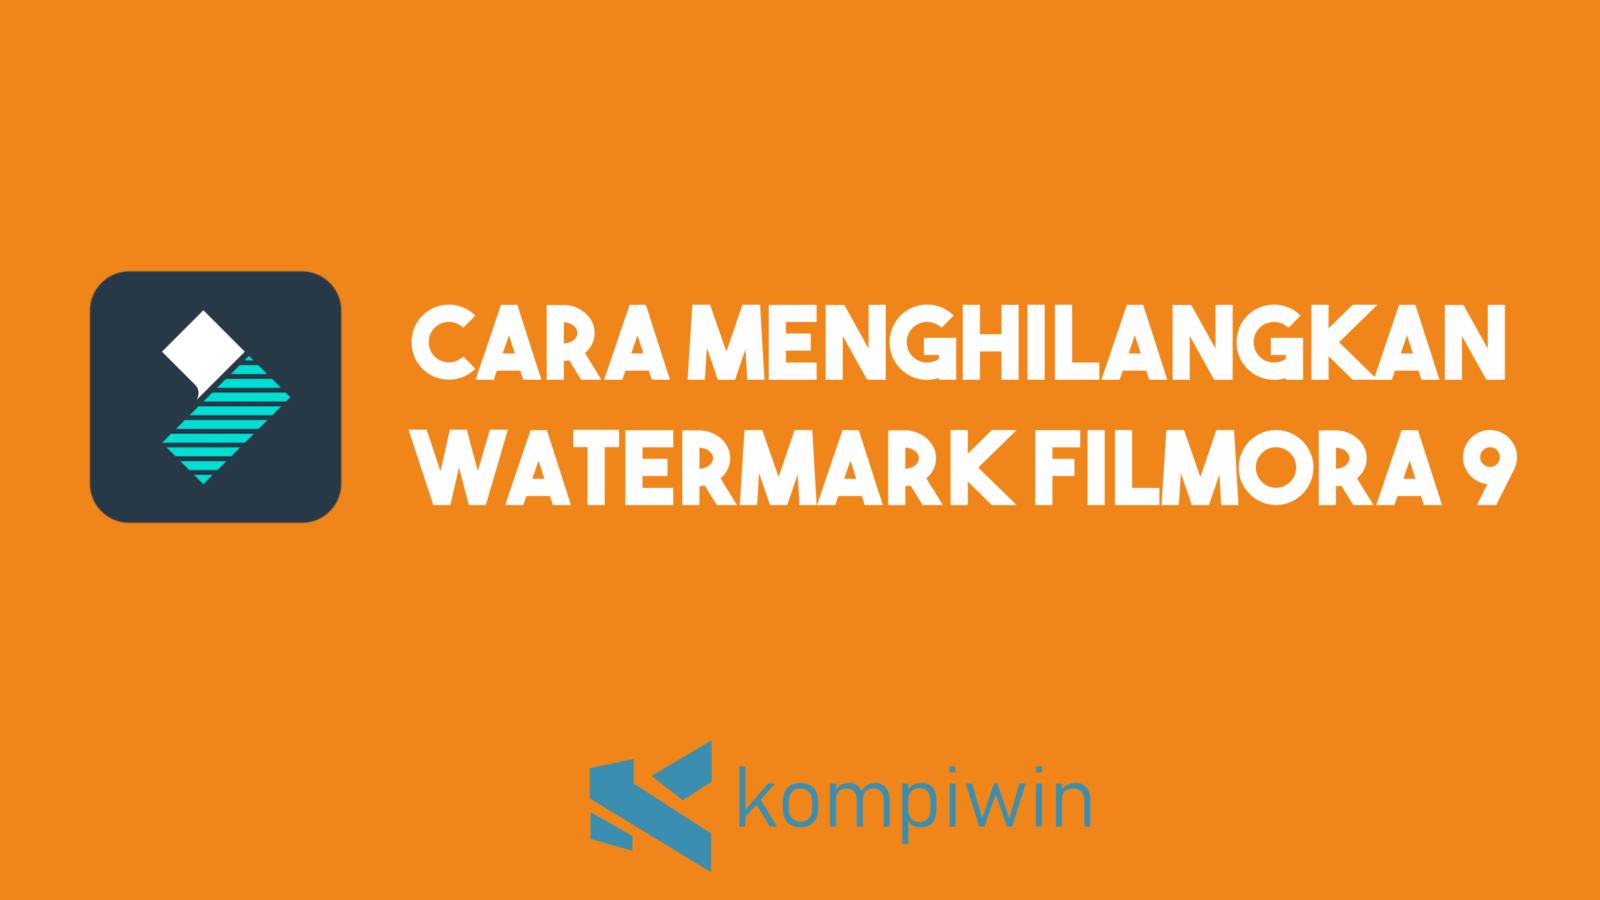 Cara Menghilangkan Watermark Filmora 9 7